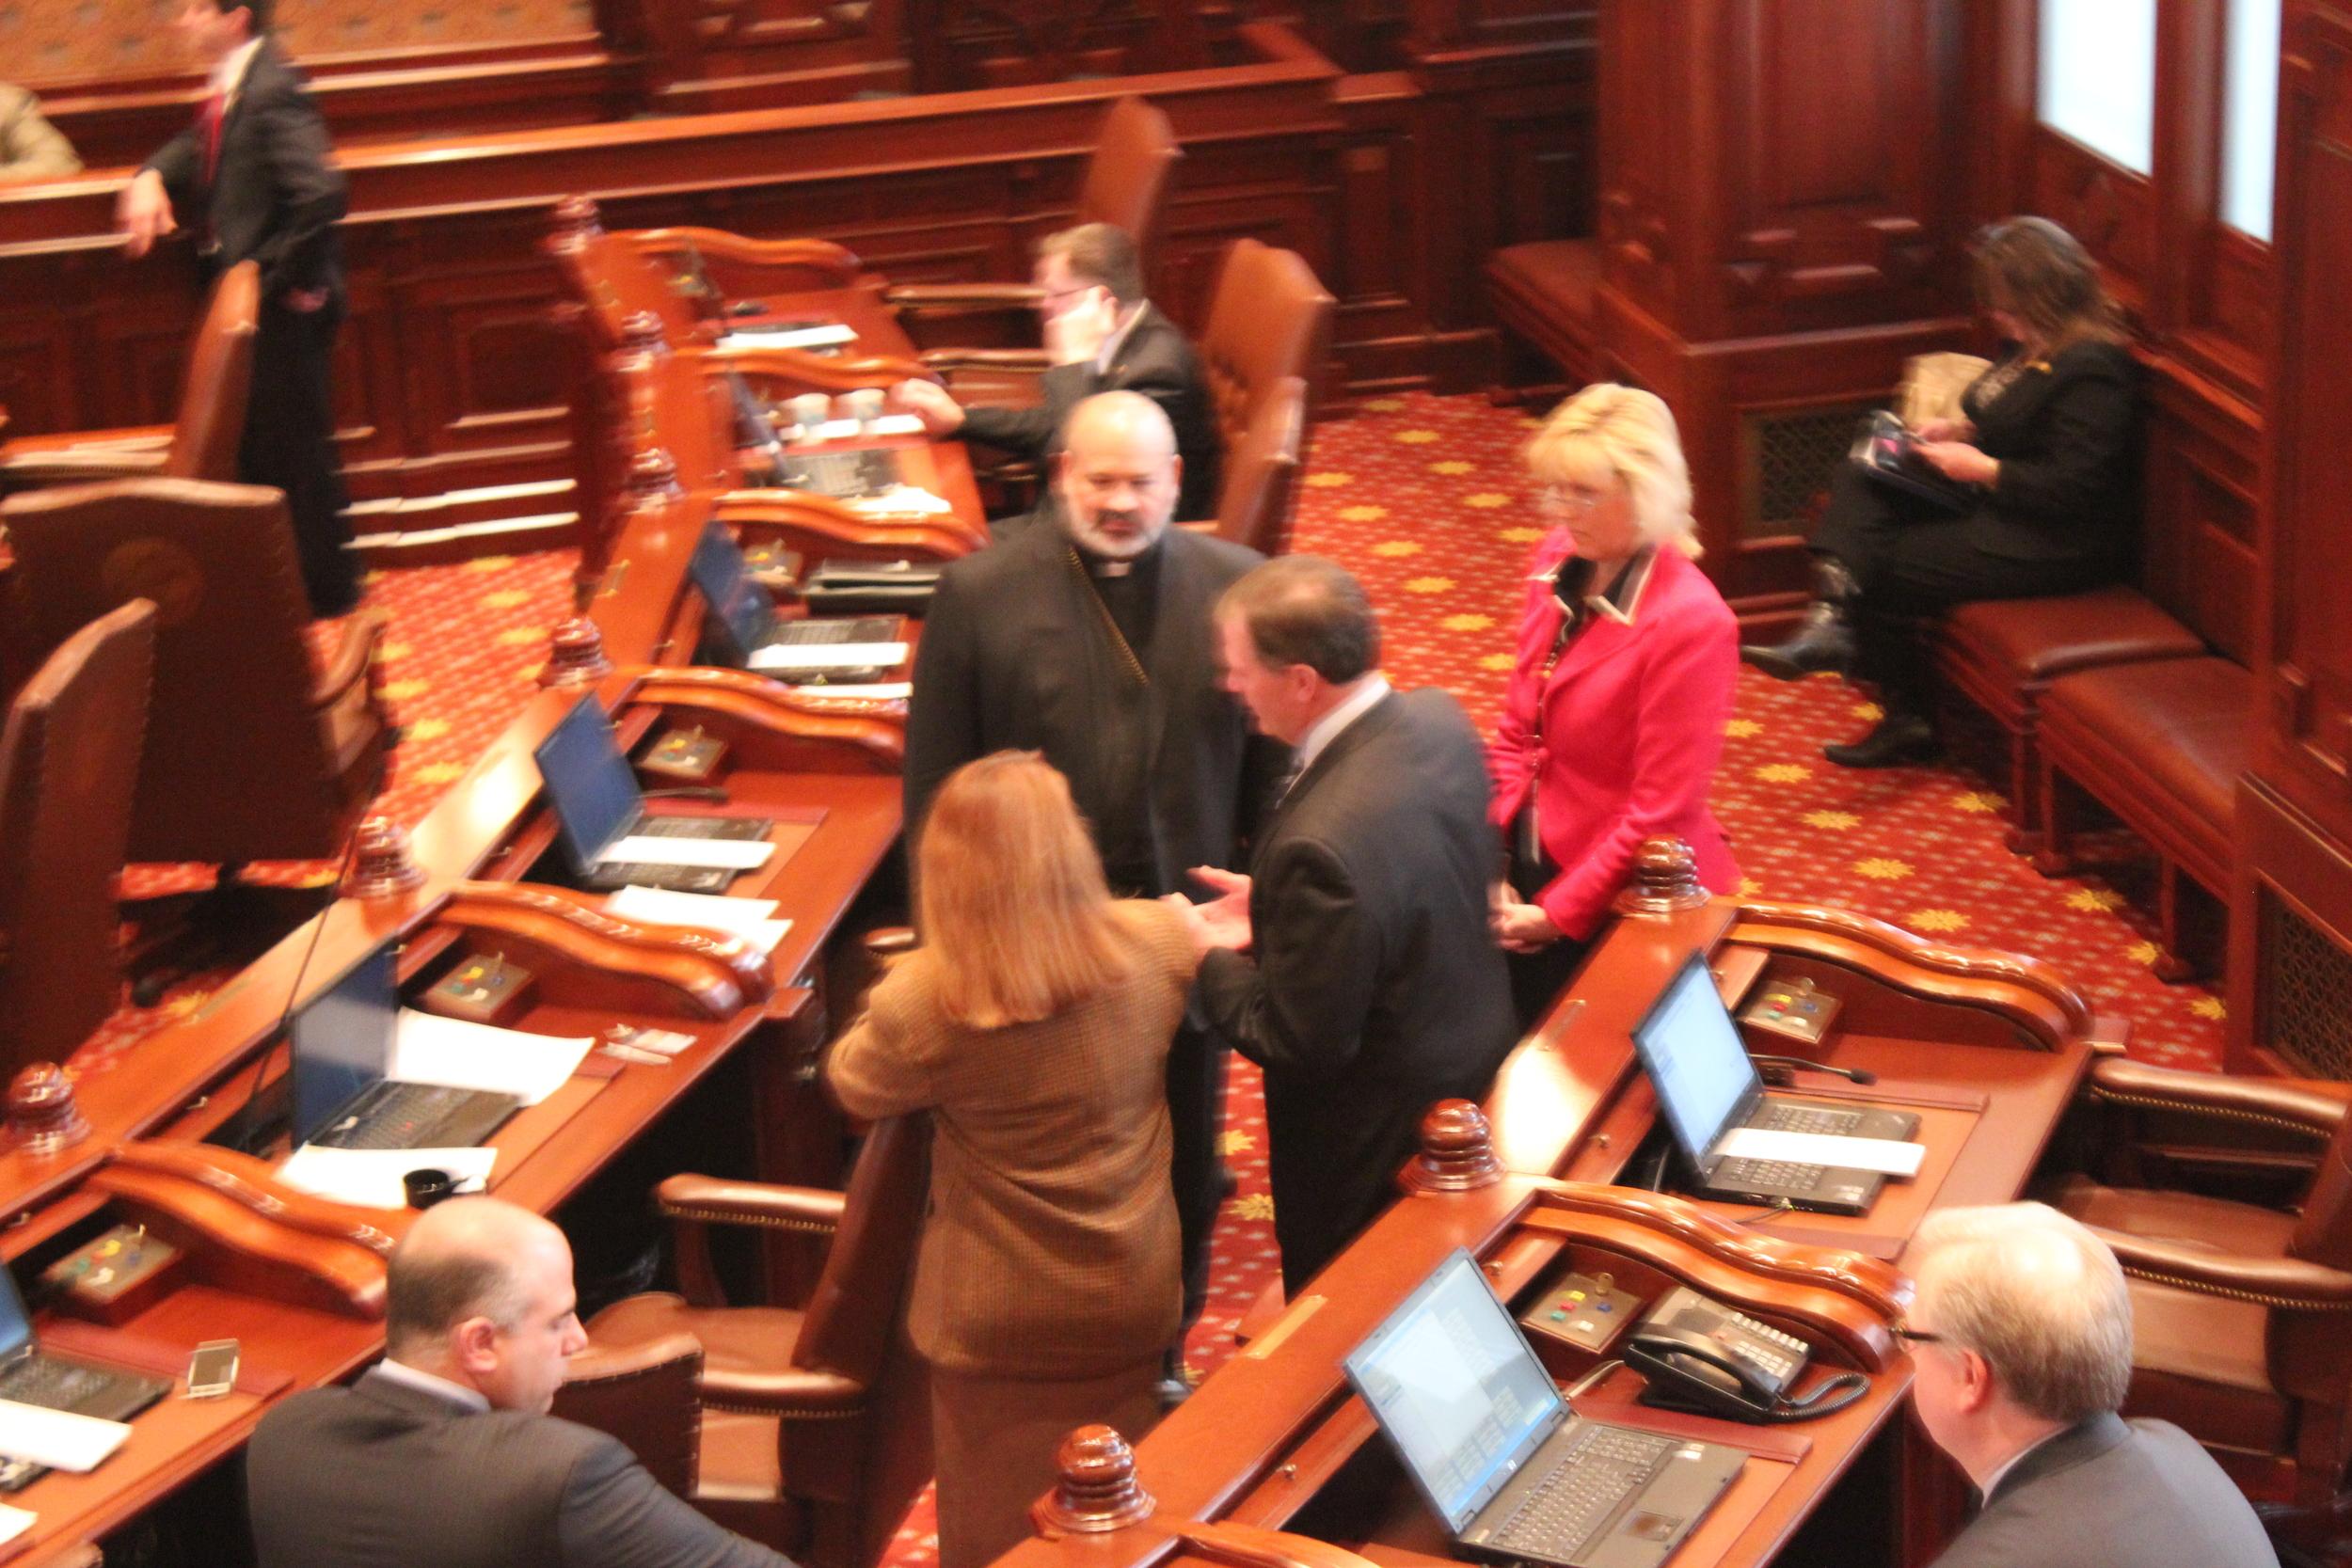 His Grace with Senator Bradley and other senators on the senate chamber floor.